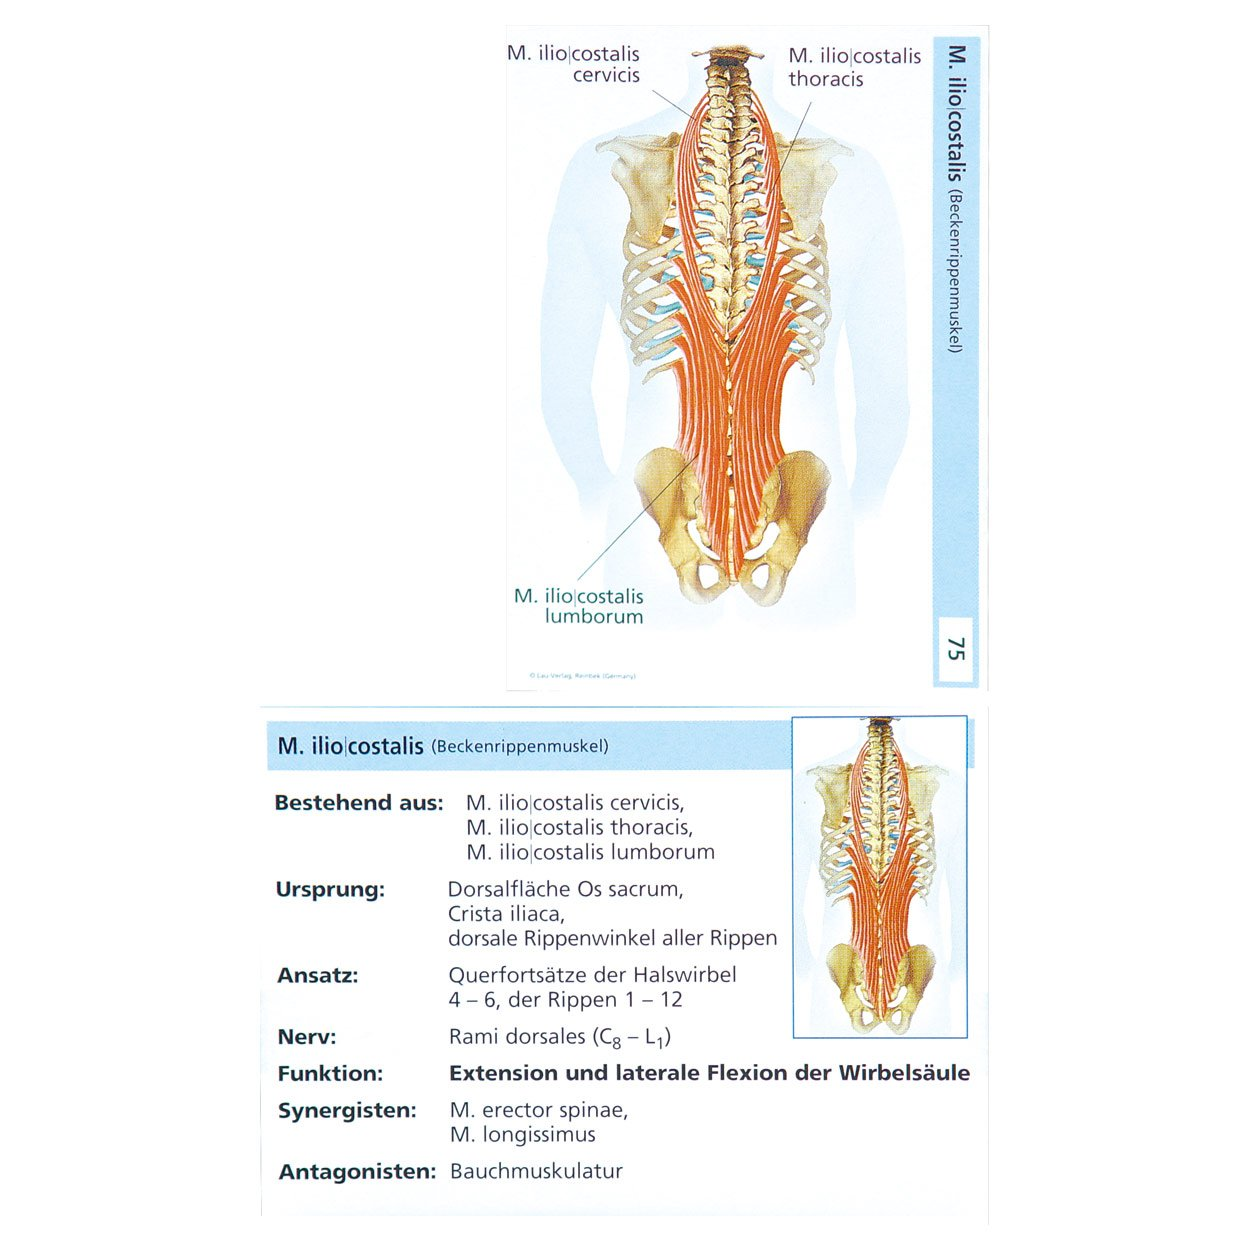 Groß Halswirbel Anatomie Bilder - Anatomie Ideen - finotti.info